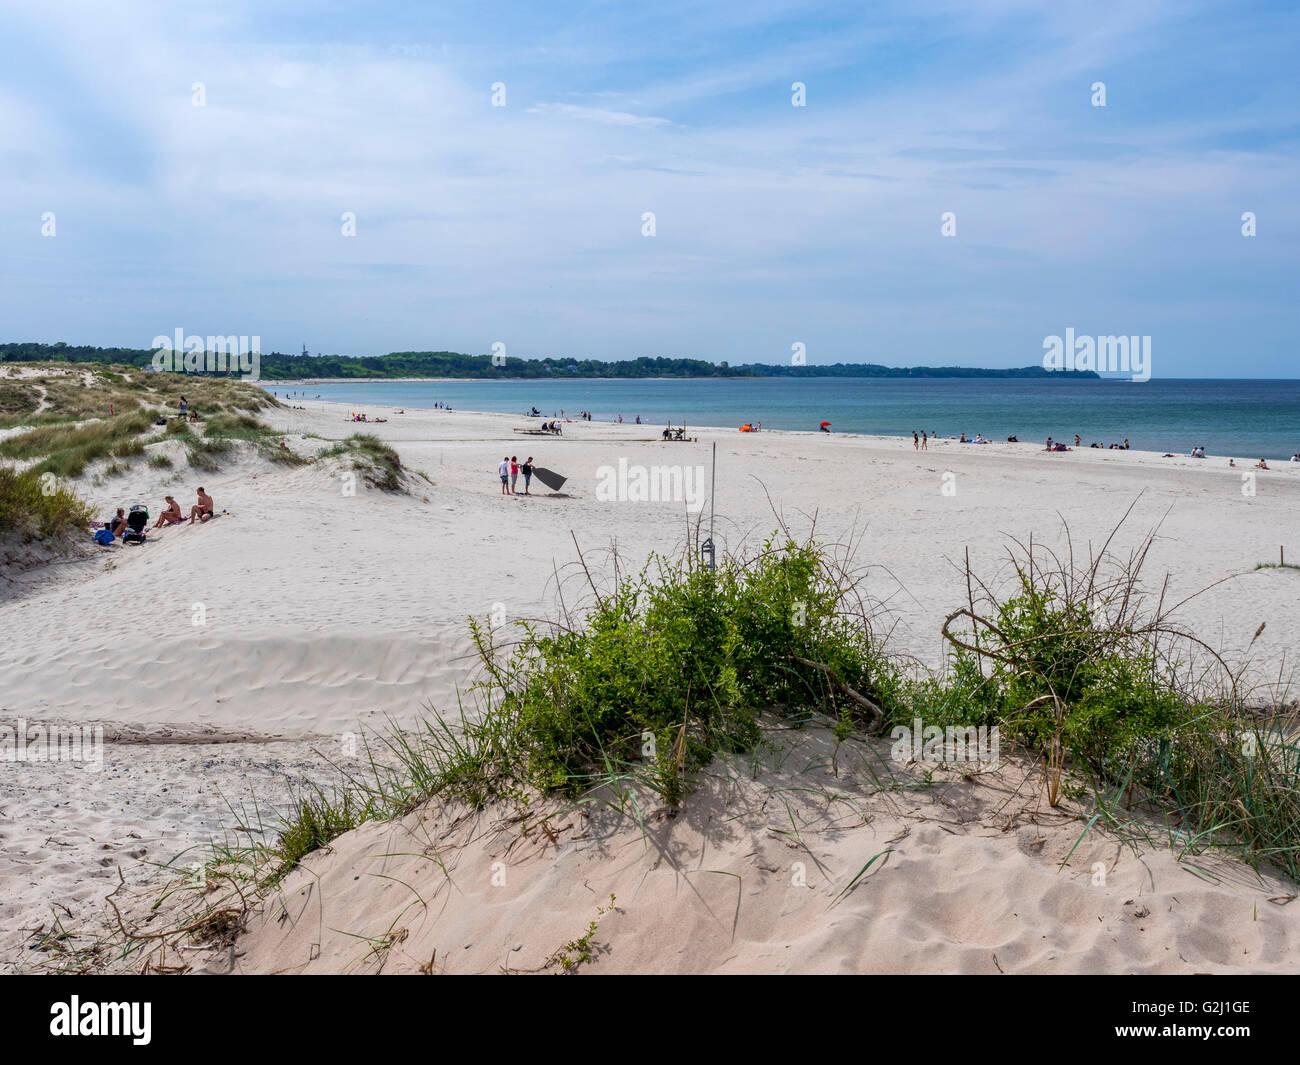 The beach at the popular summer resort Hornbaek in North Zealand, Denmark, Scandinavia, Europe - Stock Image